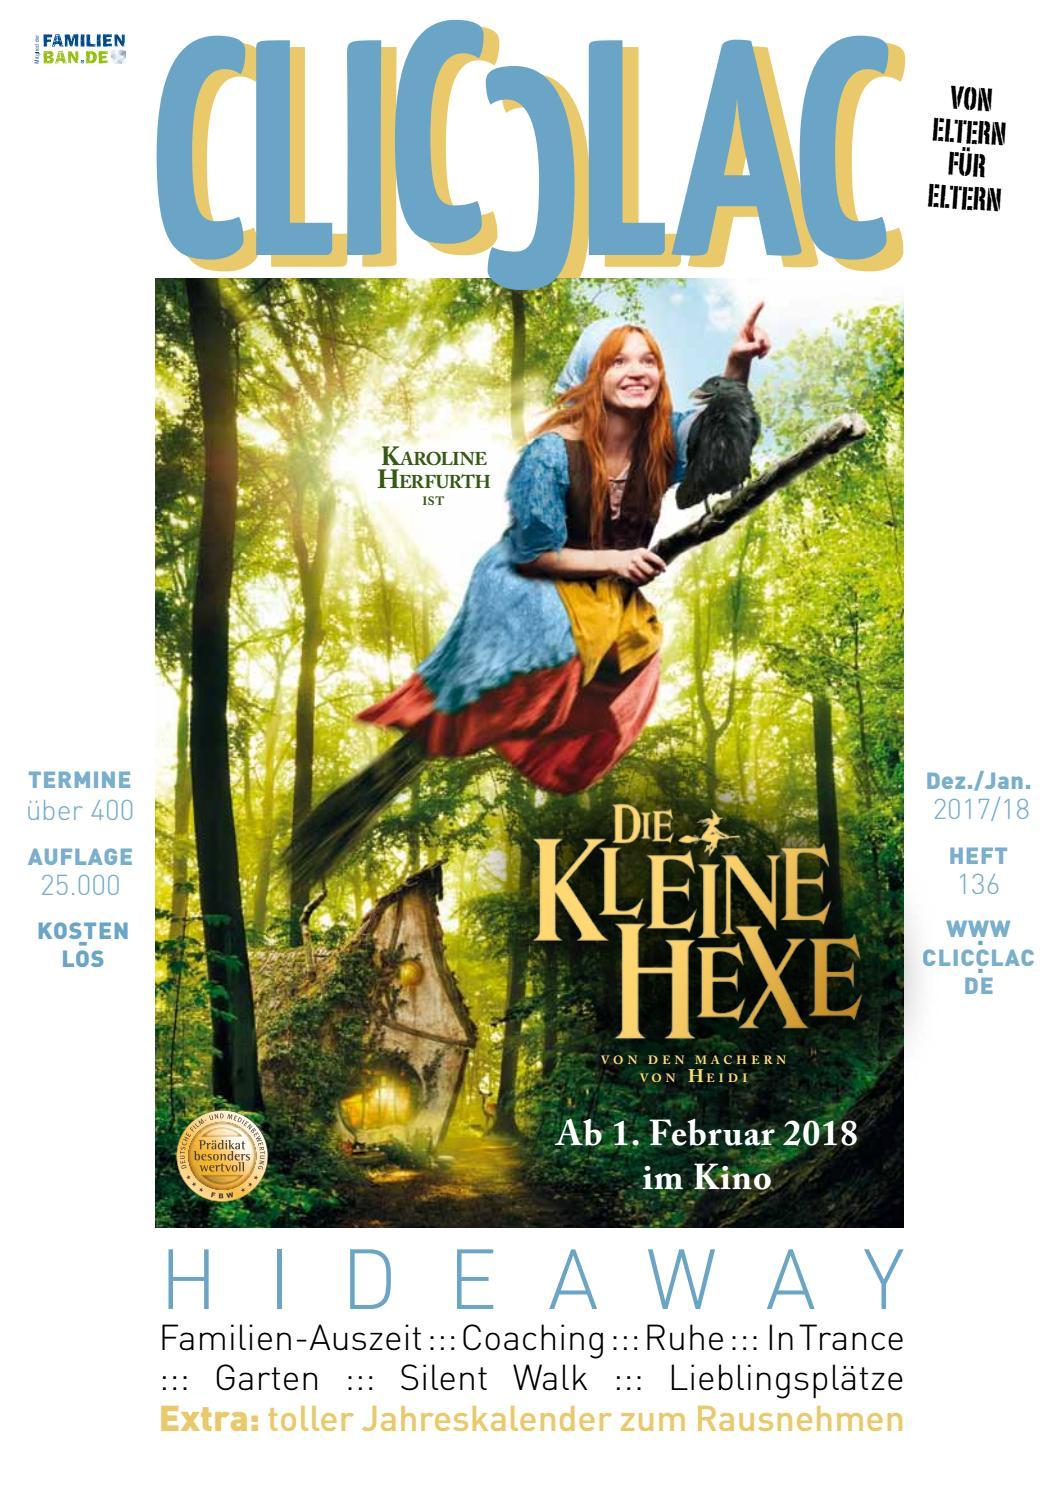 Clicclac   Dez. 2017 + Jan. 2018 By Clicclac   Stadtmagazin Für Familien    Issuu